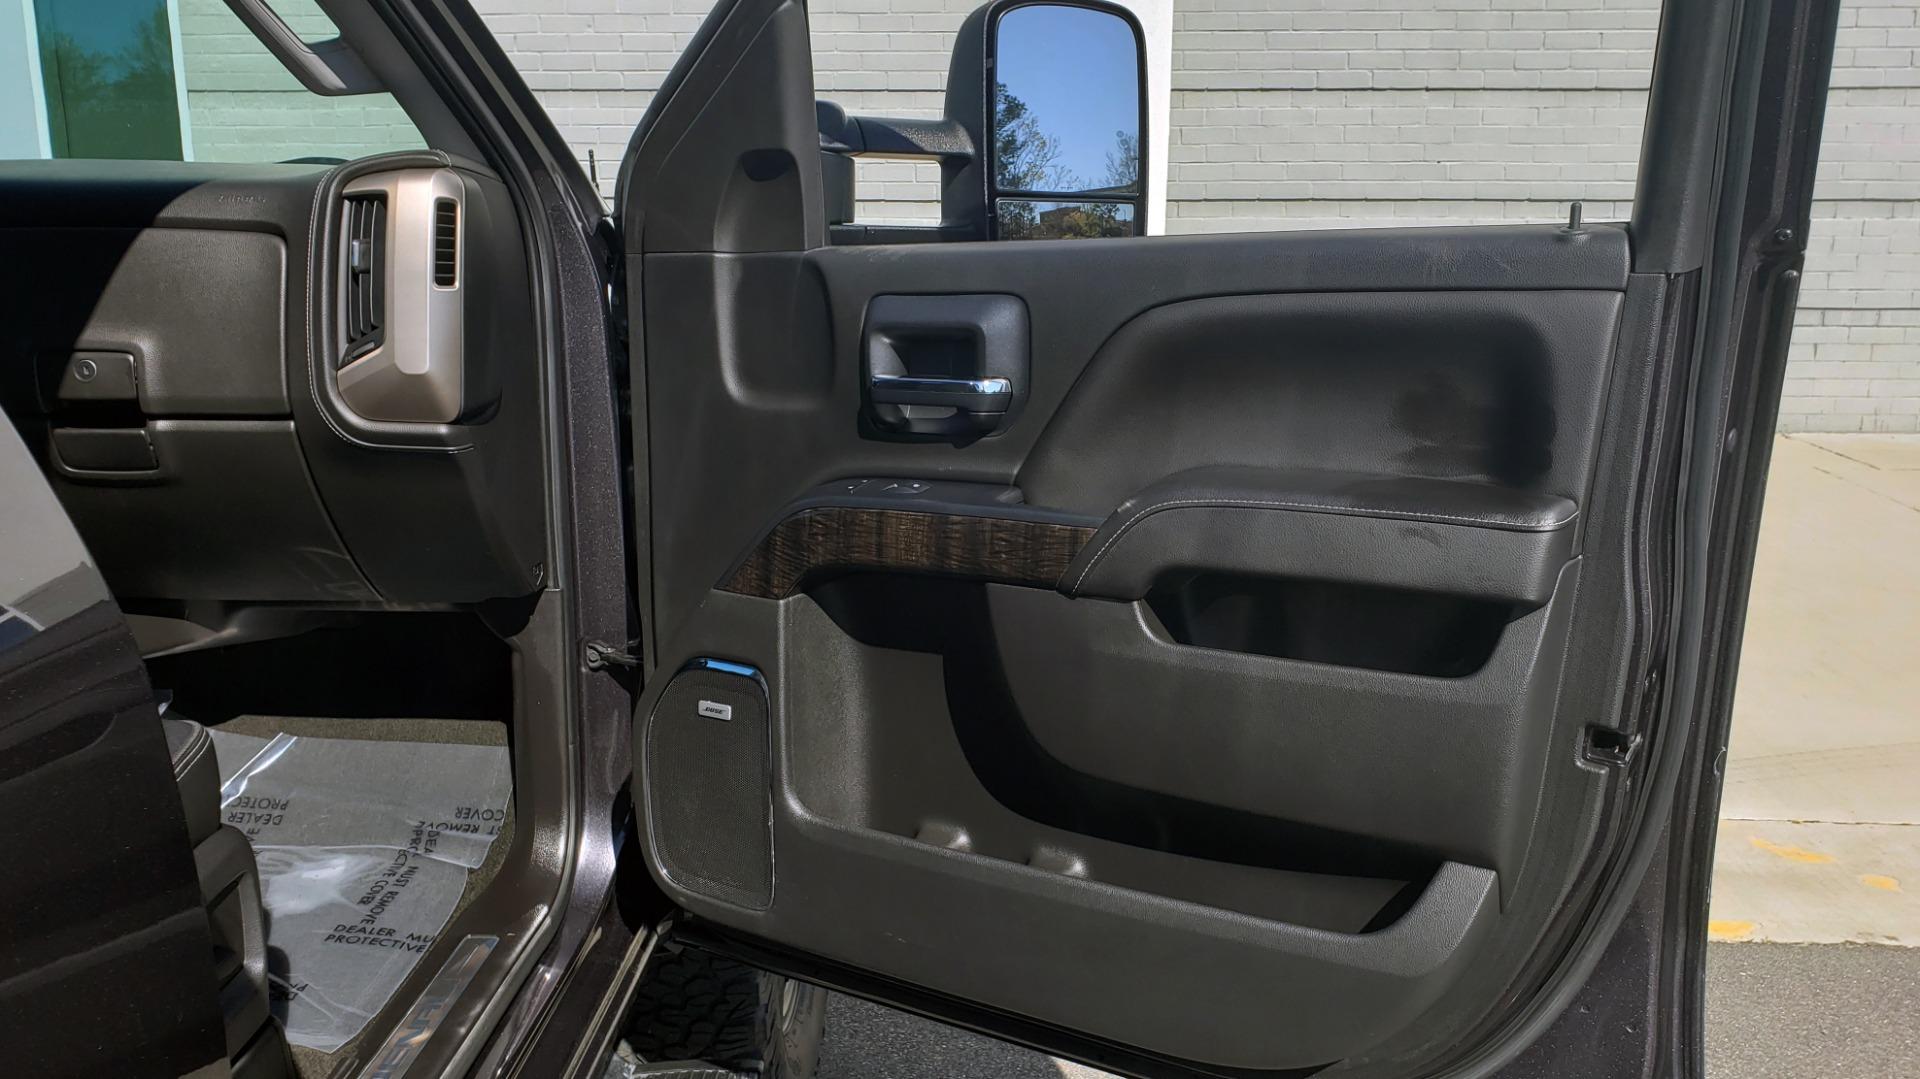 Used 2015 GMC SIERRA 2500HD DENALI 4WD CREWCAB / 6.6L DURAMAX / 6-SPD AUTO / NAV / BOSE for sale $50,995 at Formula Imports in Charlotte NC 28227 74